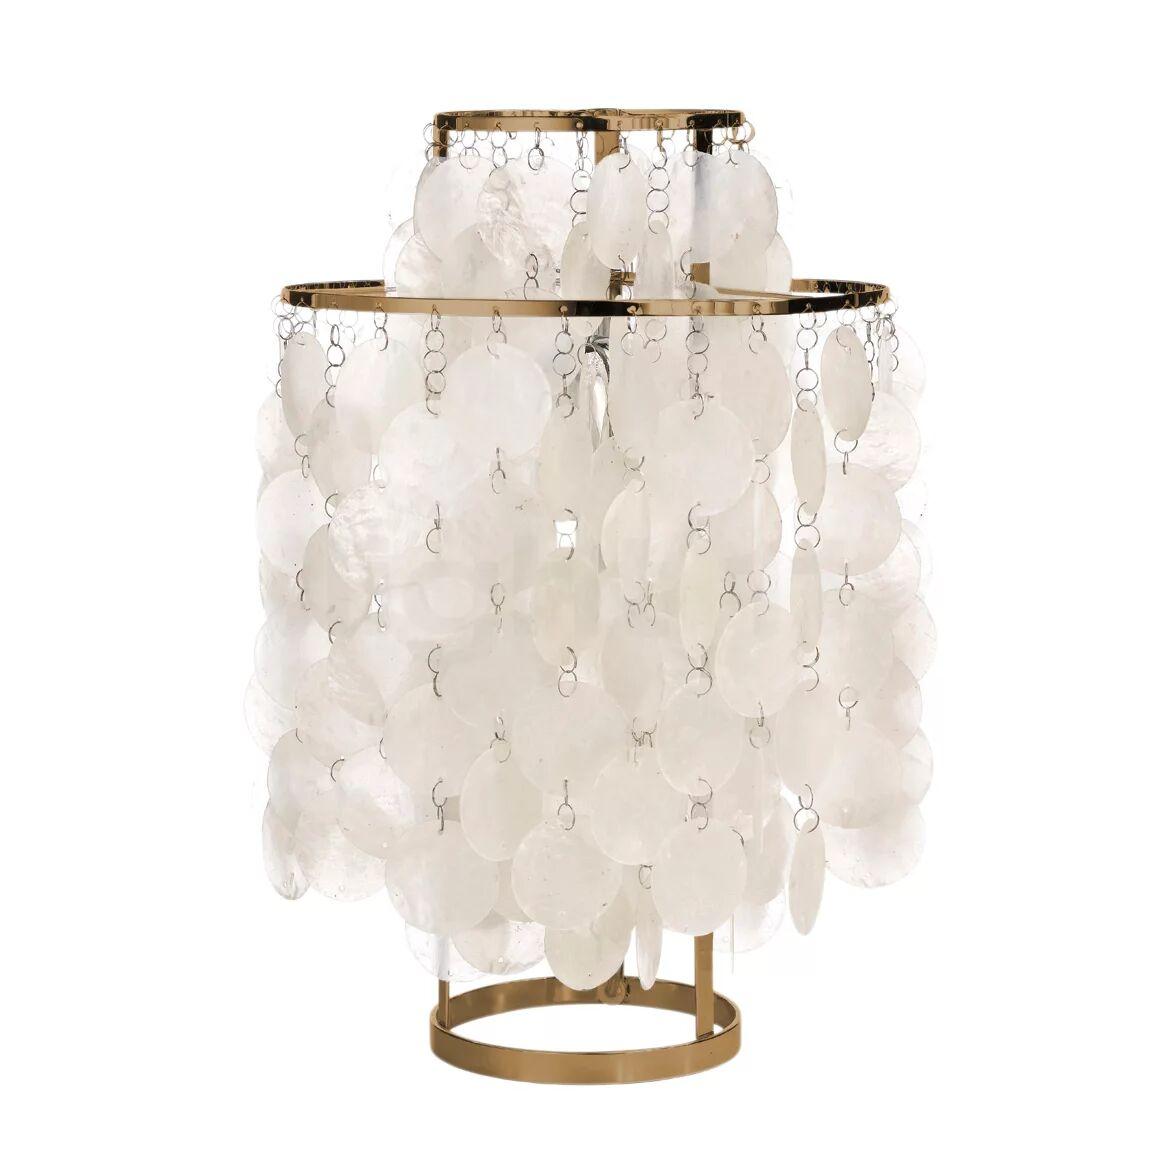 Verpan Fun 2TM Lampe de table, laiton